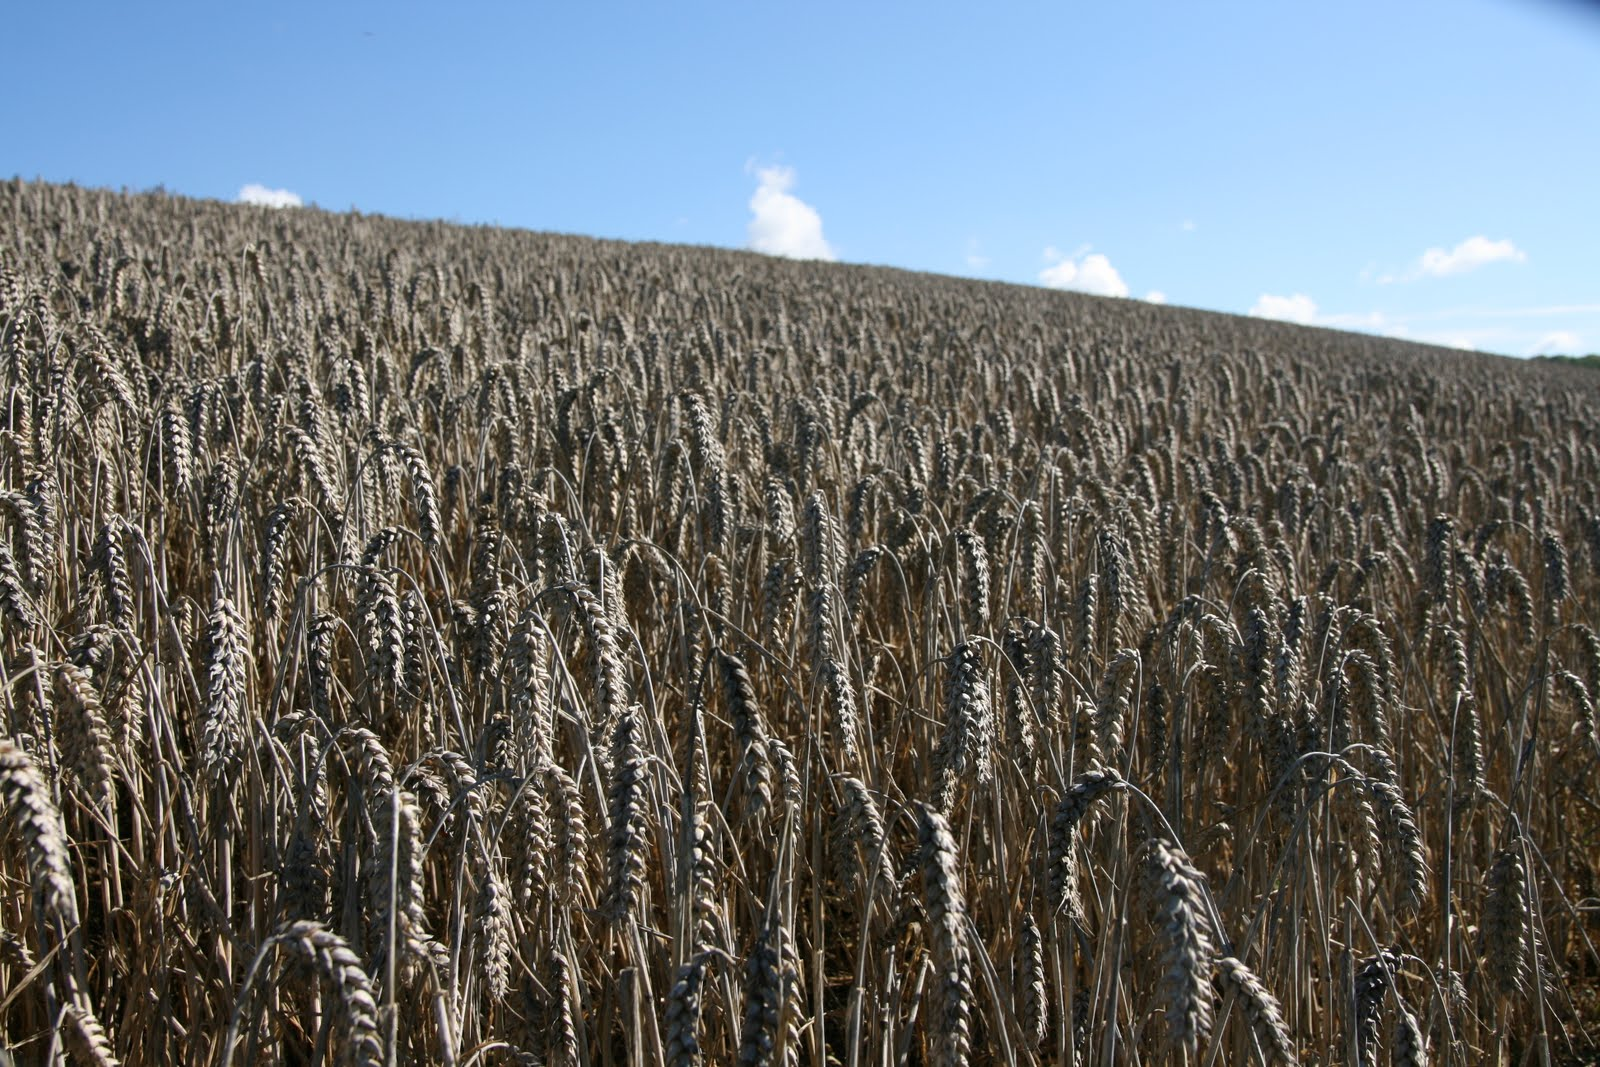 1008 066 Alton Circular, Hampshire, England Wheat past it's prime